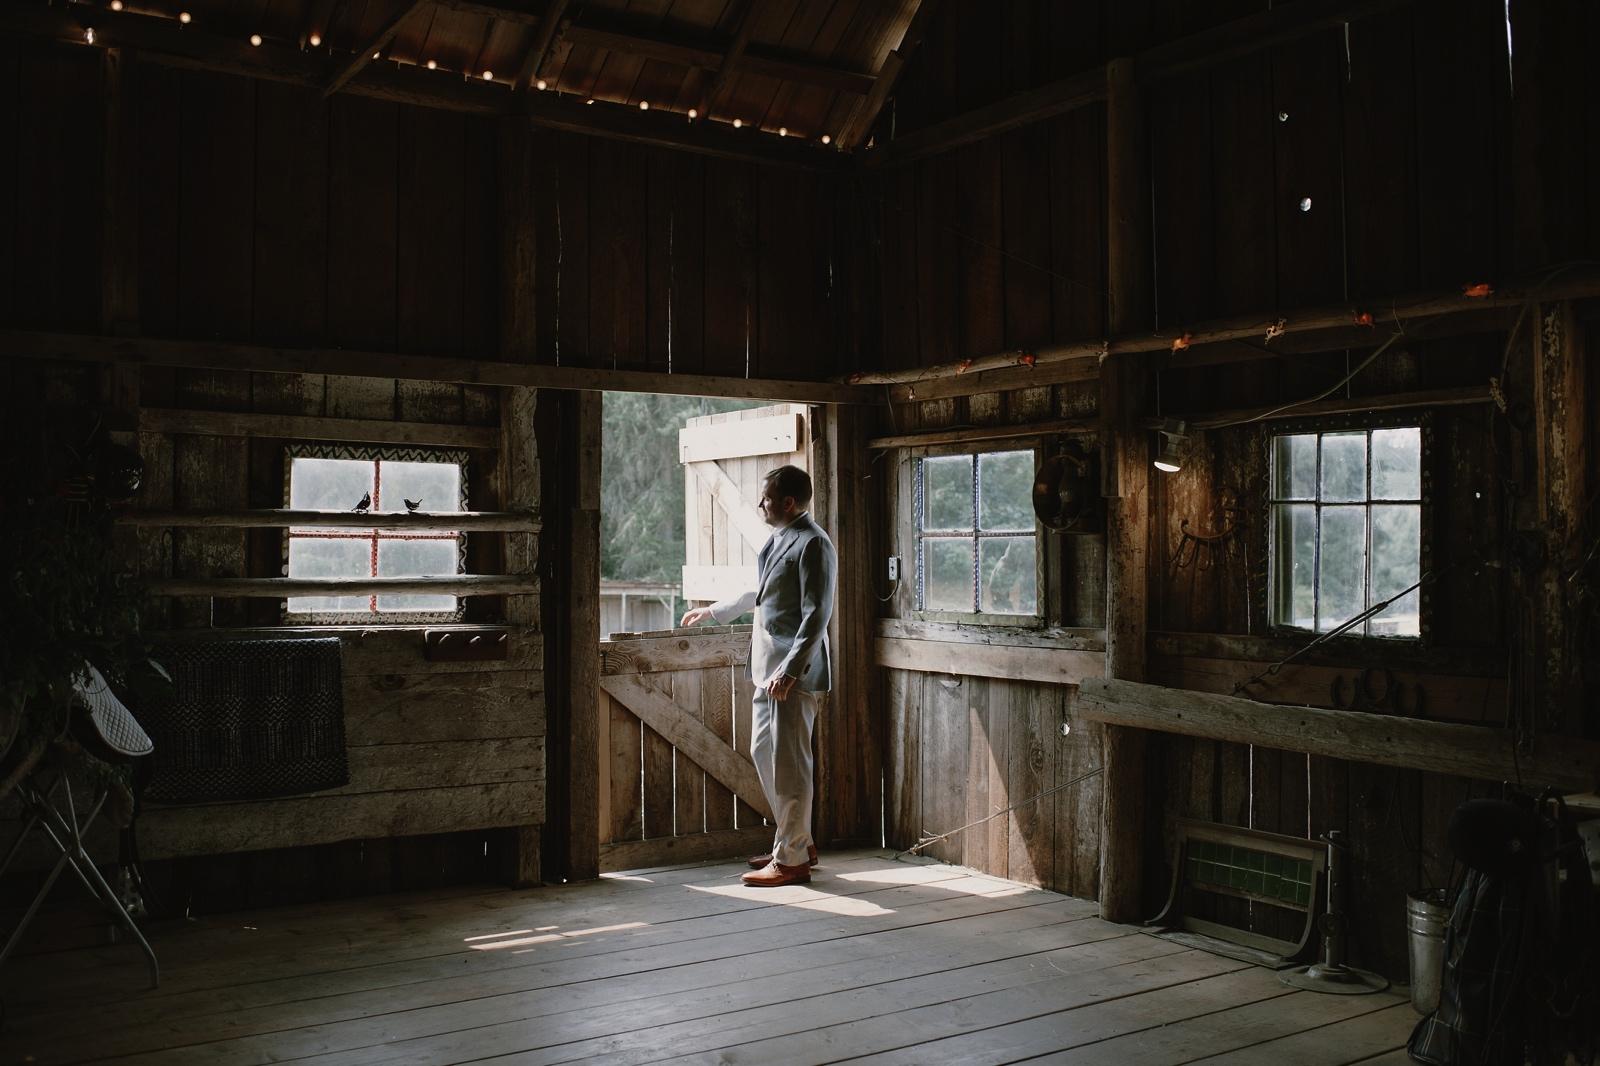 Backyard_Vashon_Island_Wedding_Kristen_Marie_Parker018.JPG